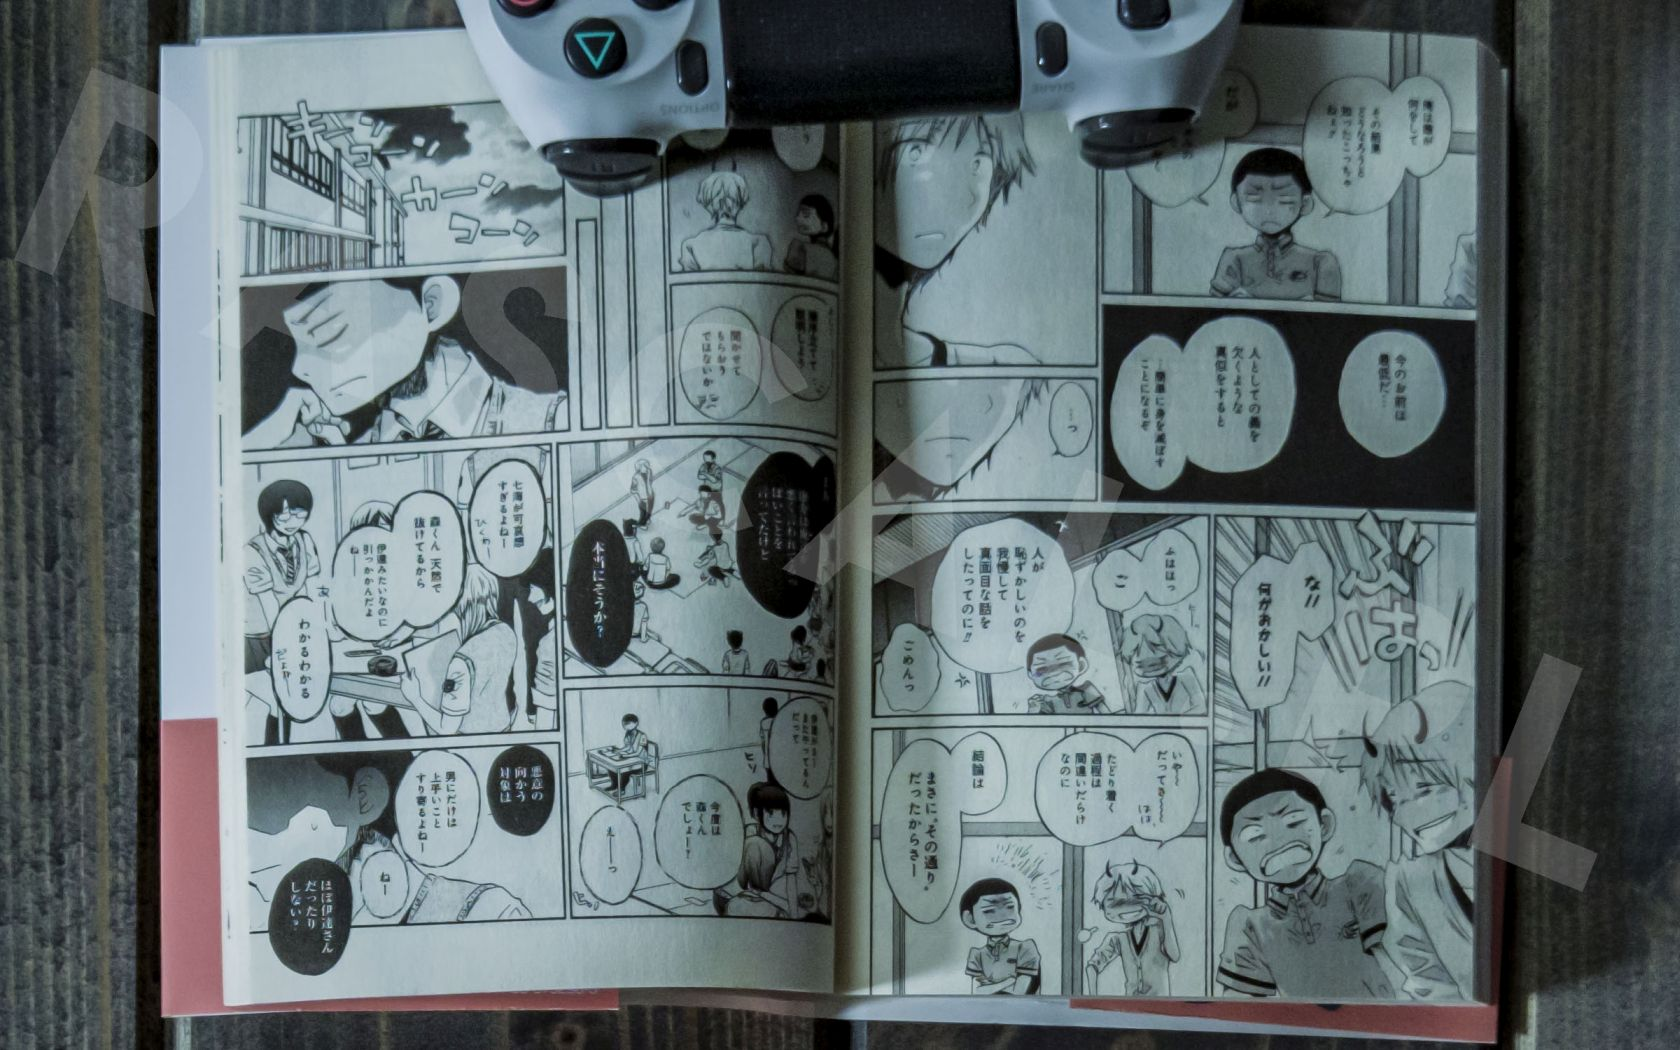 Renai Shikakuka Phenomenon (1-2) - Young Jump Comics Ultra - Nowości w kolekcji mangi (listopad 2020) - rascal.pl